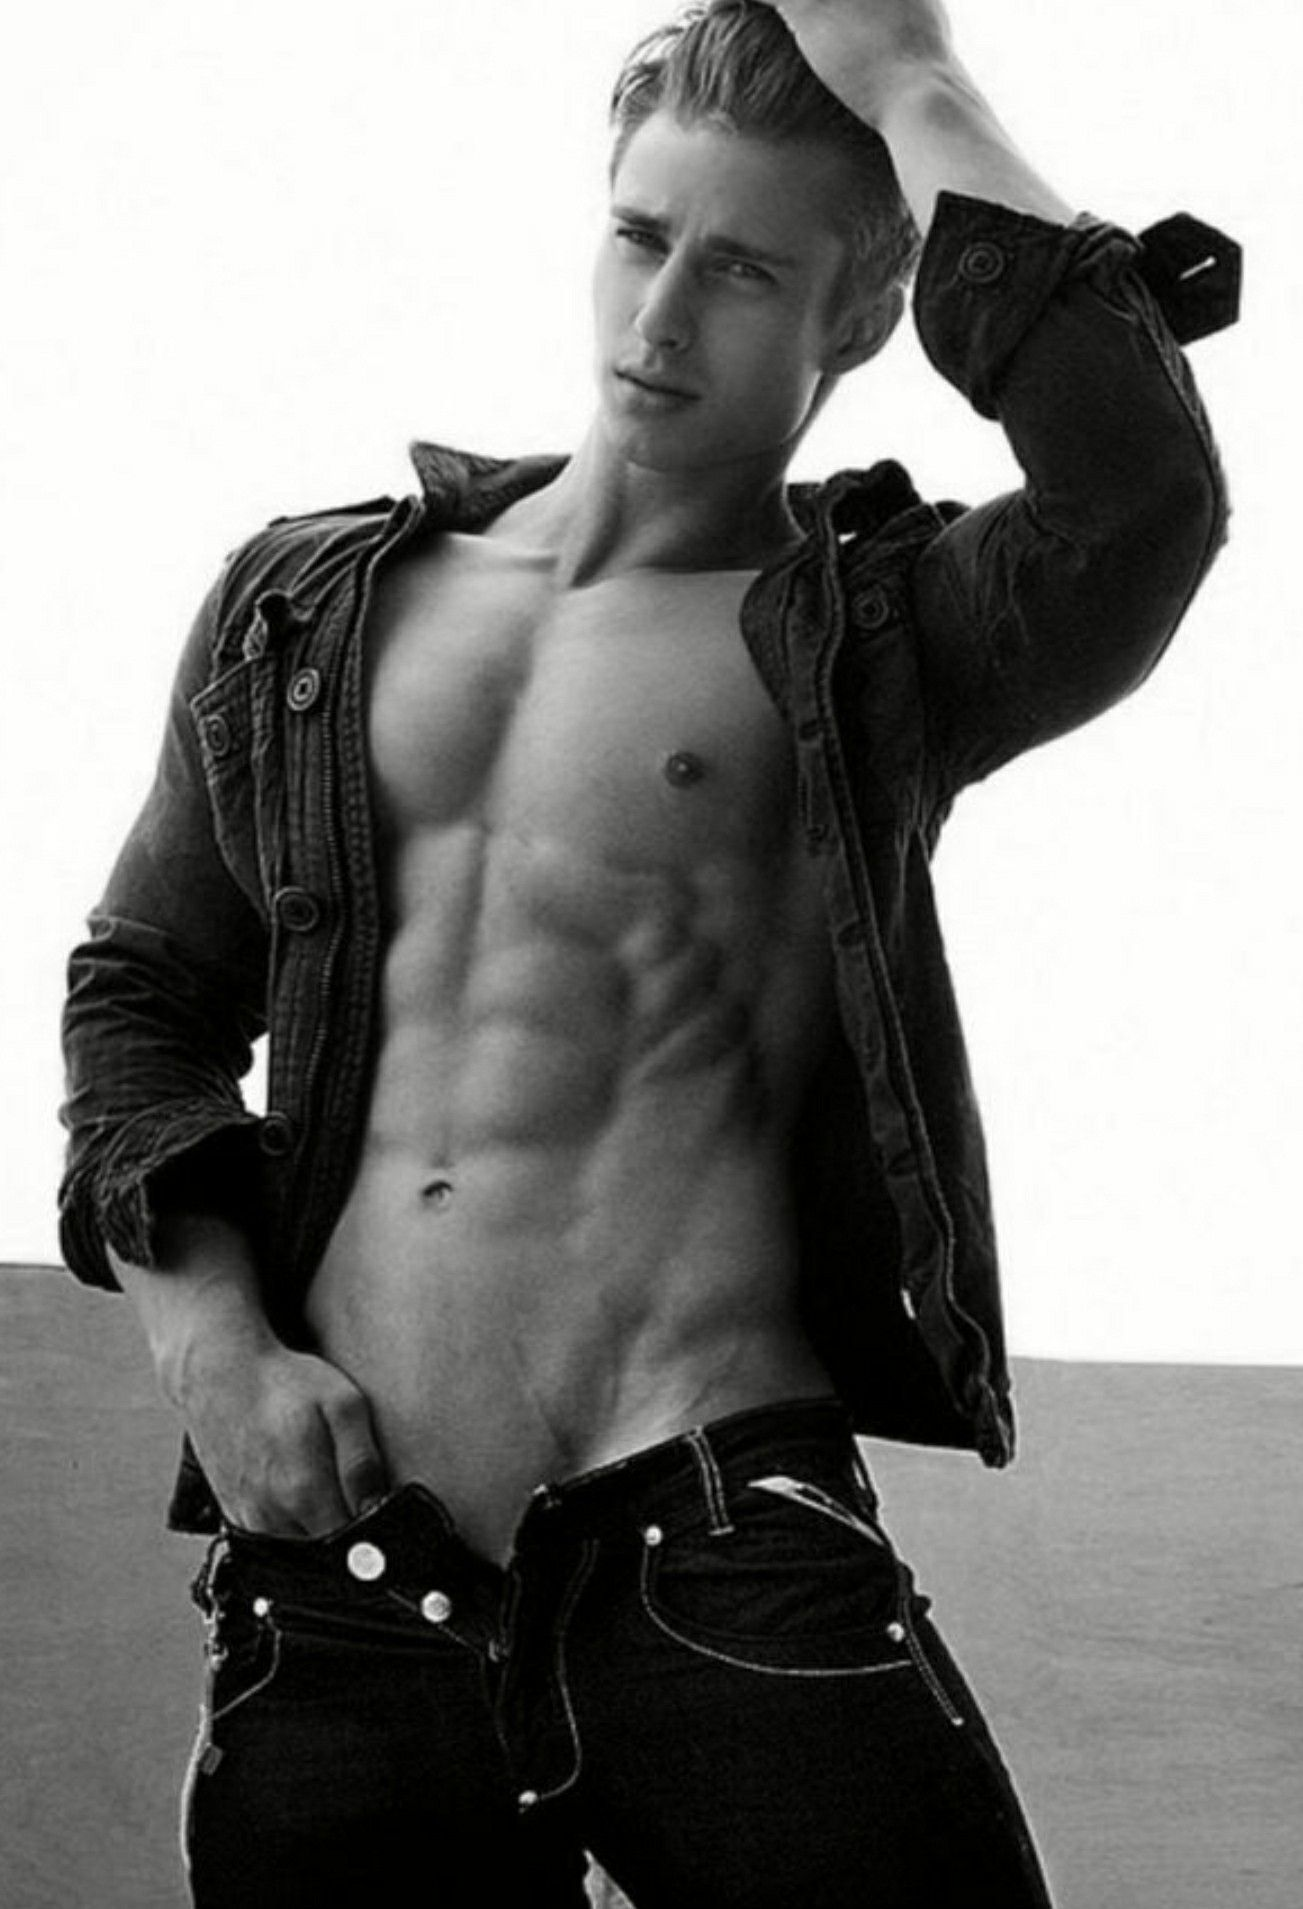 Sexy guy | Men Black & White | Pinterest | Male torso and Sexy guys